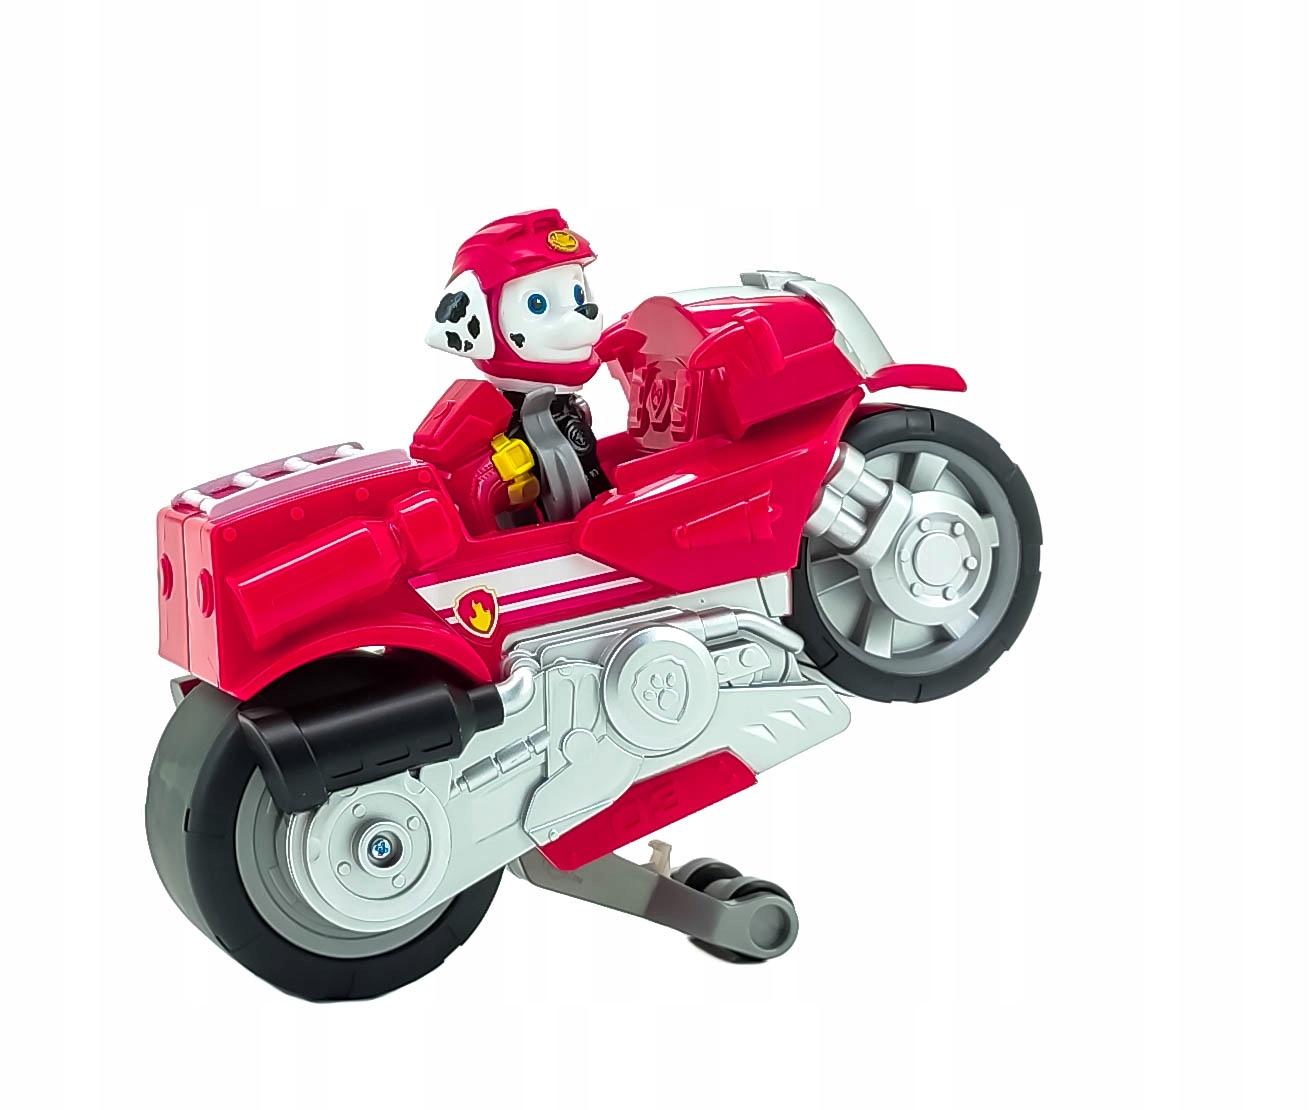 PSI PATROL MARSHALL FIGURKA I MOTOCYKL MOTO PUPS Kod producenta 6060225